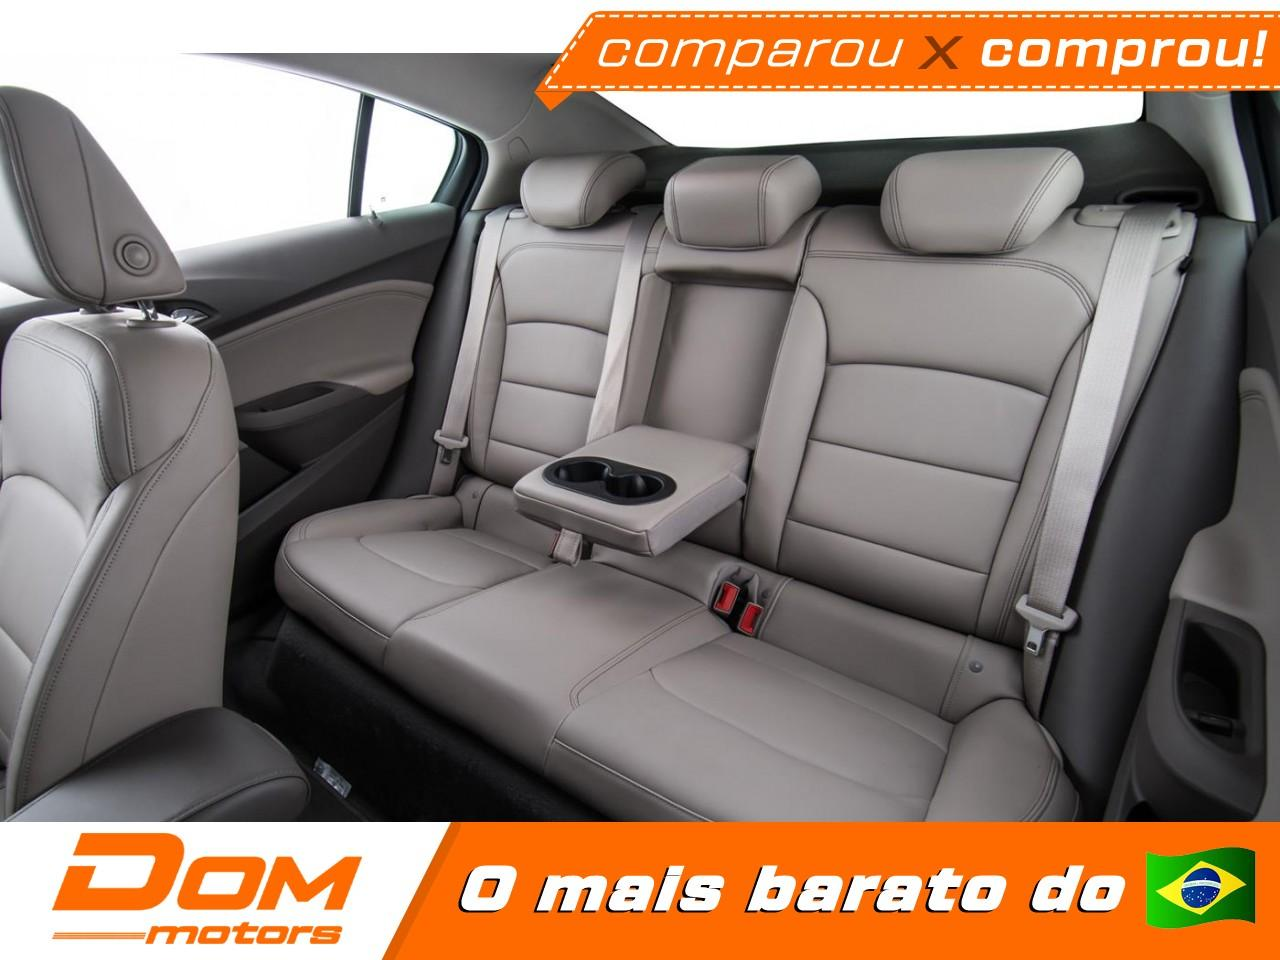 CHEVROLET Cruze Sedan 1.4 16V 4P LTZ FLEX TURBO AUTOMÁTICO, Foto 3